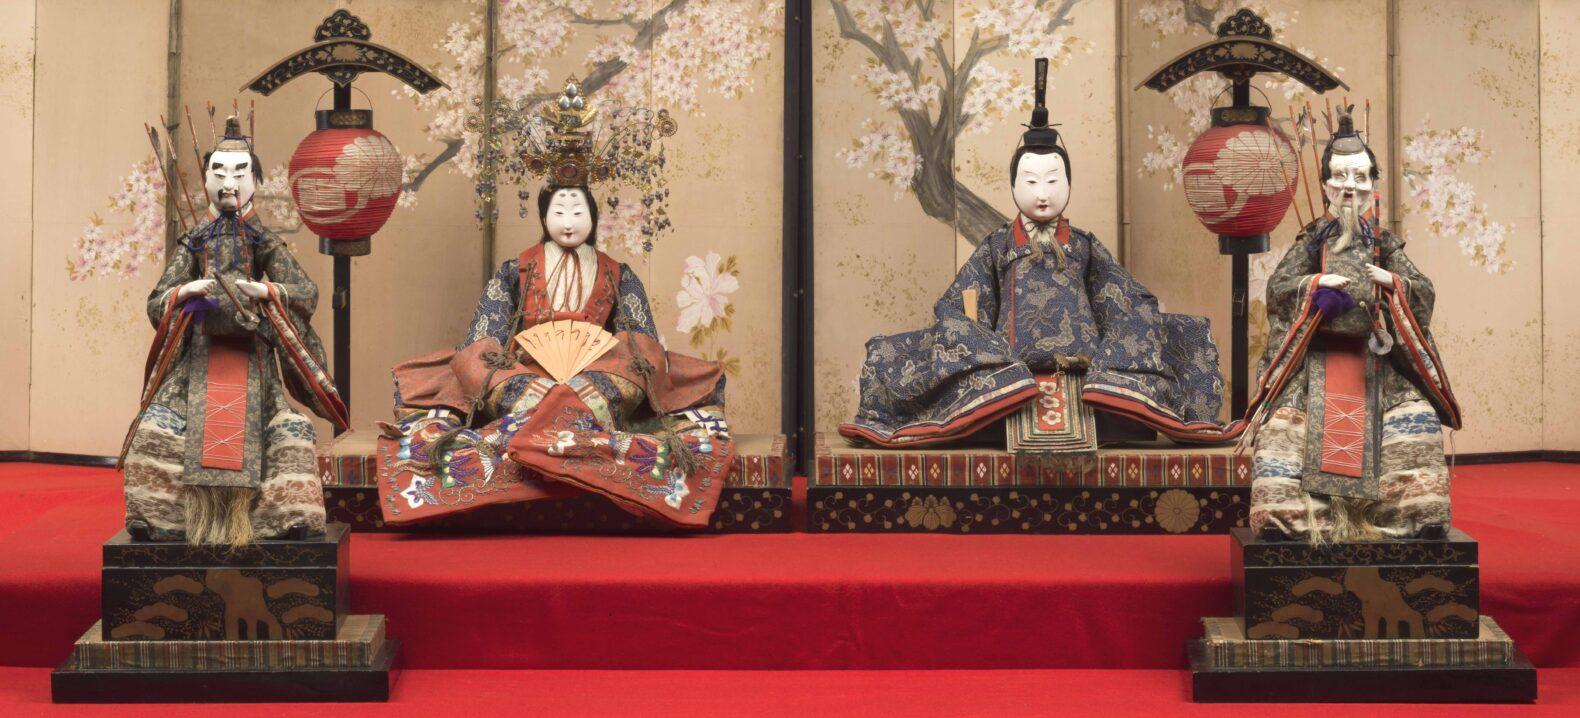 名古屋伝統の雛人形